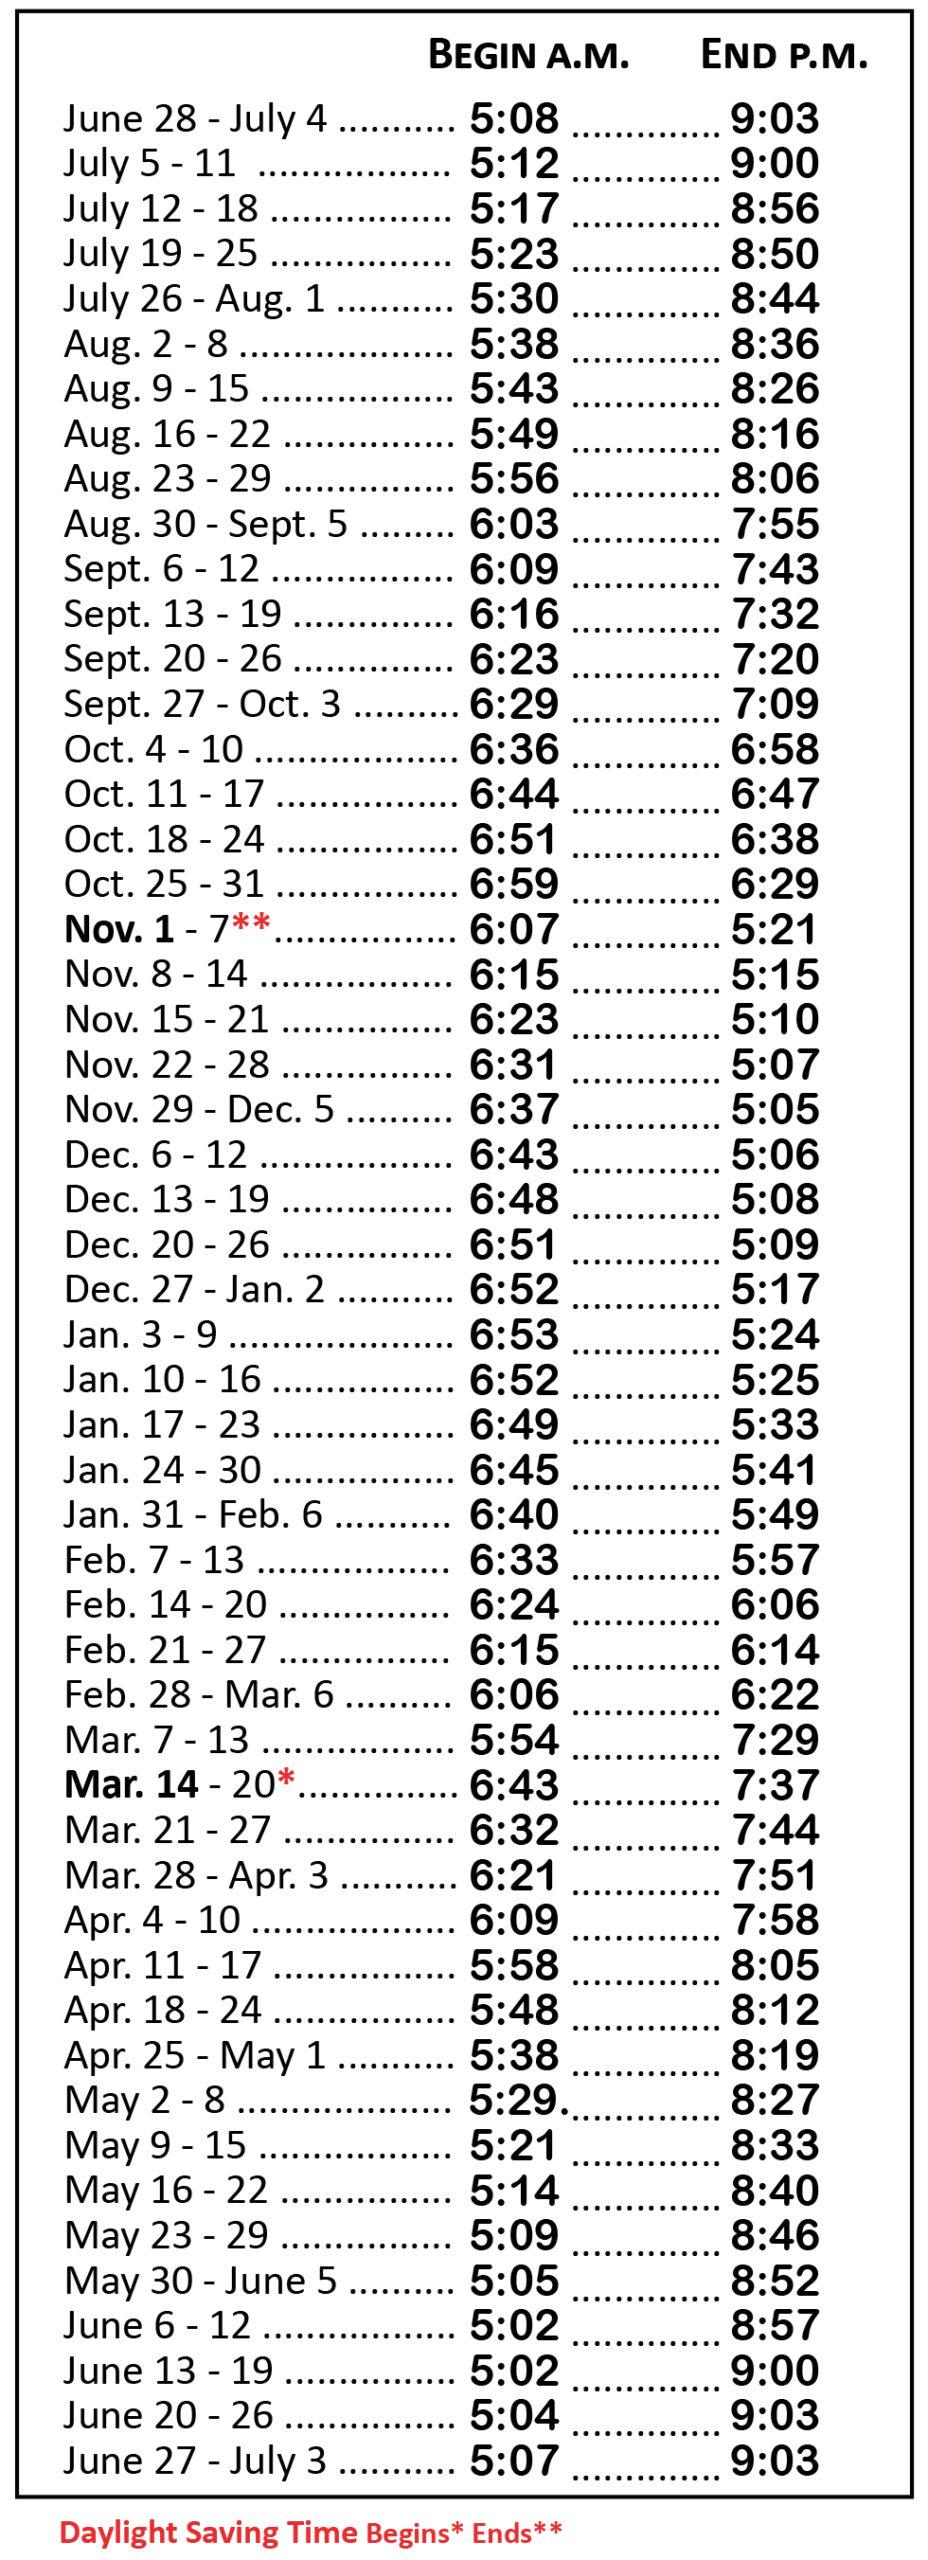 2020-21 Hunting Hours Table for Deer Rut Calendar 2021